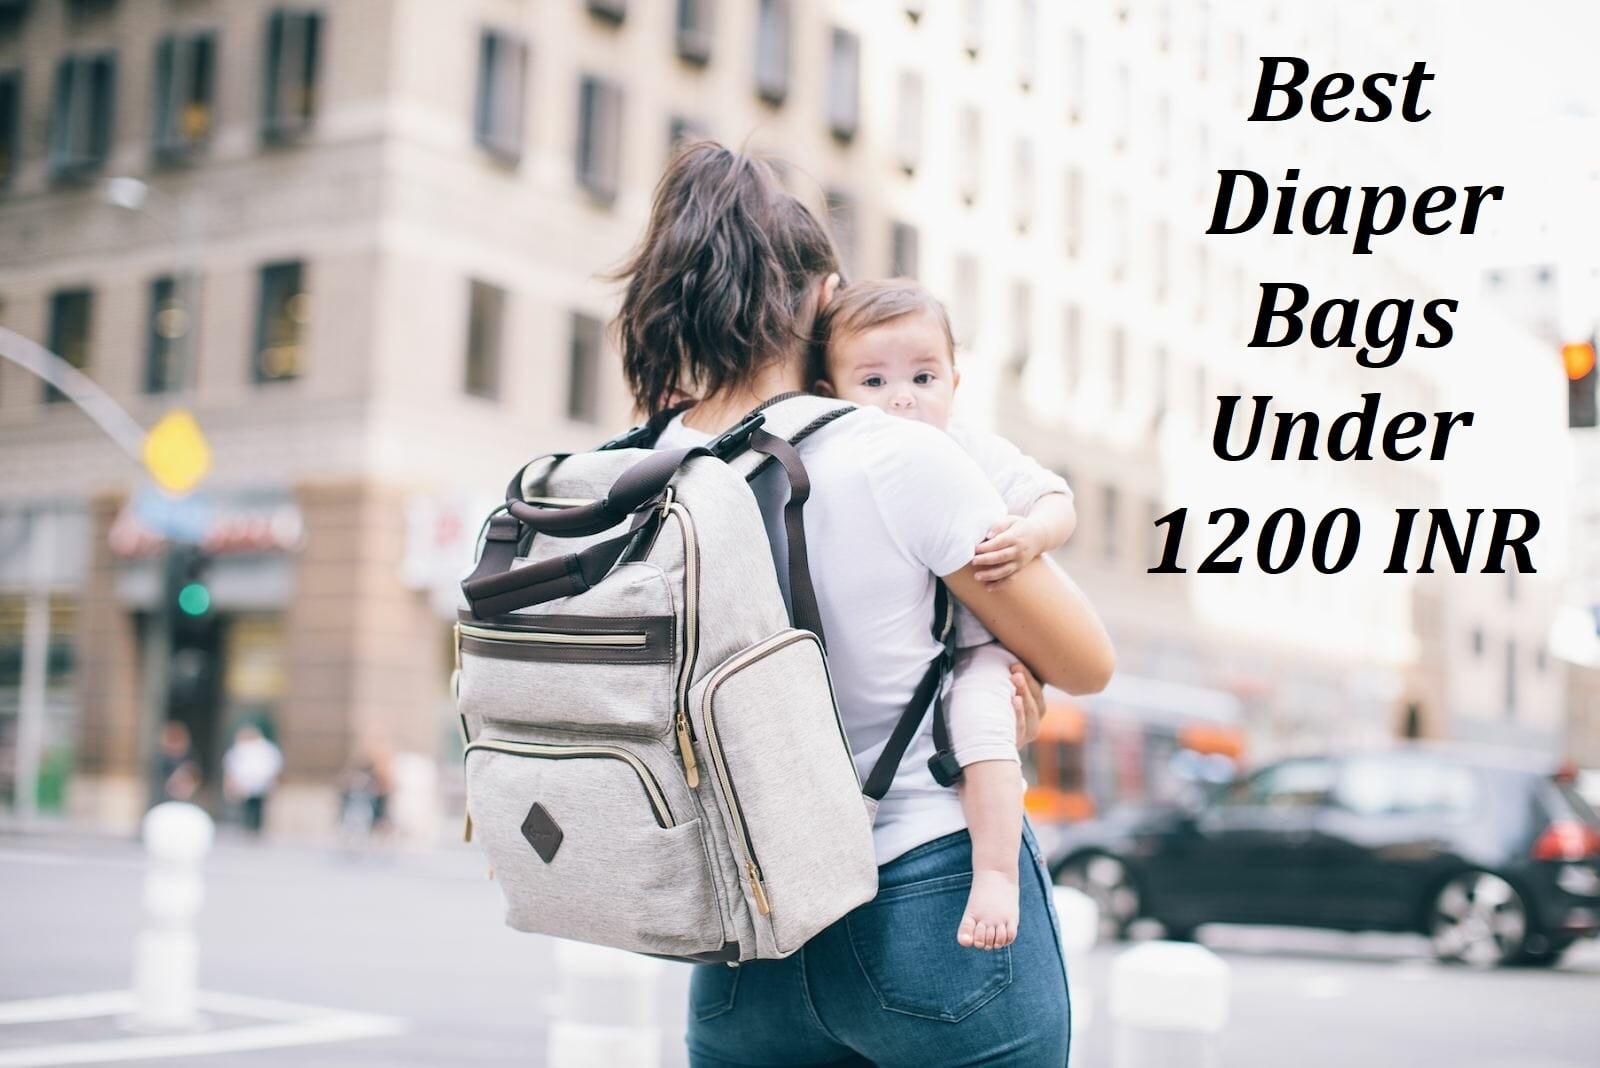 best diaper bags under 1200